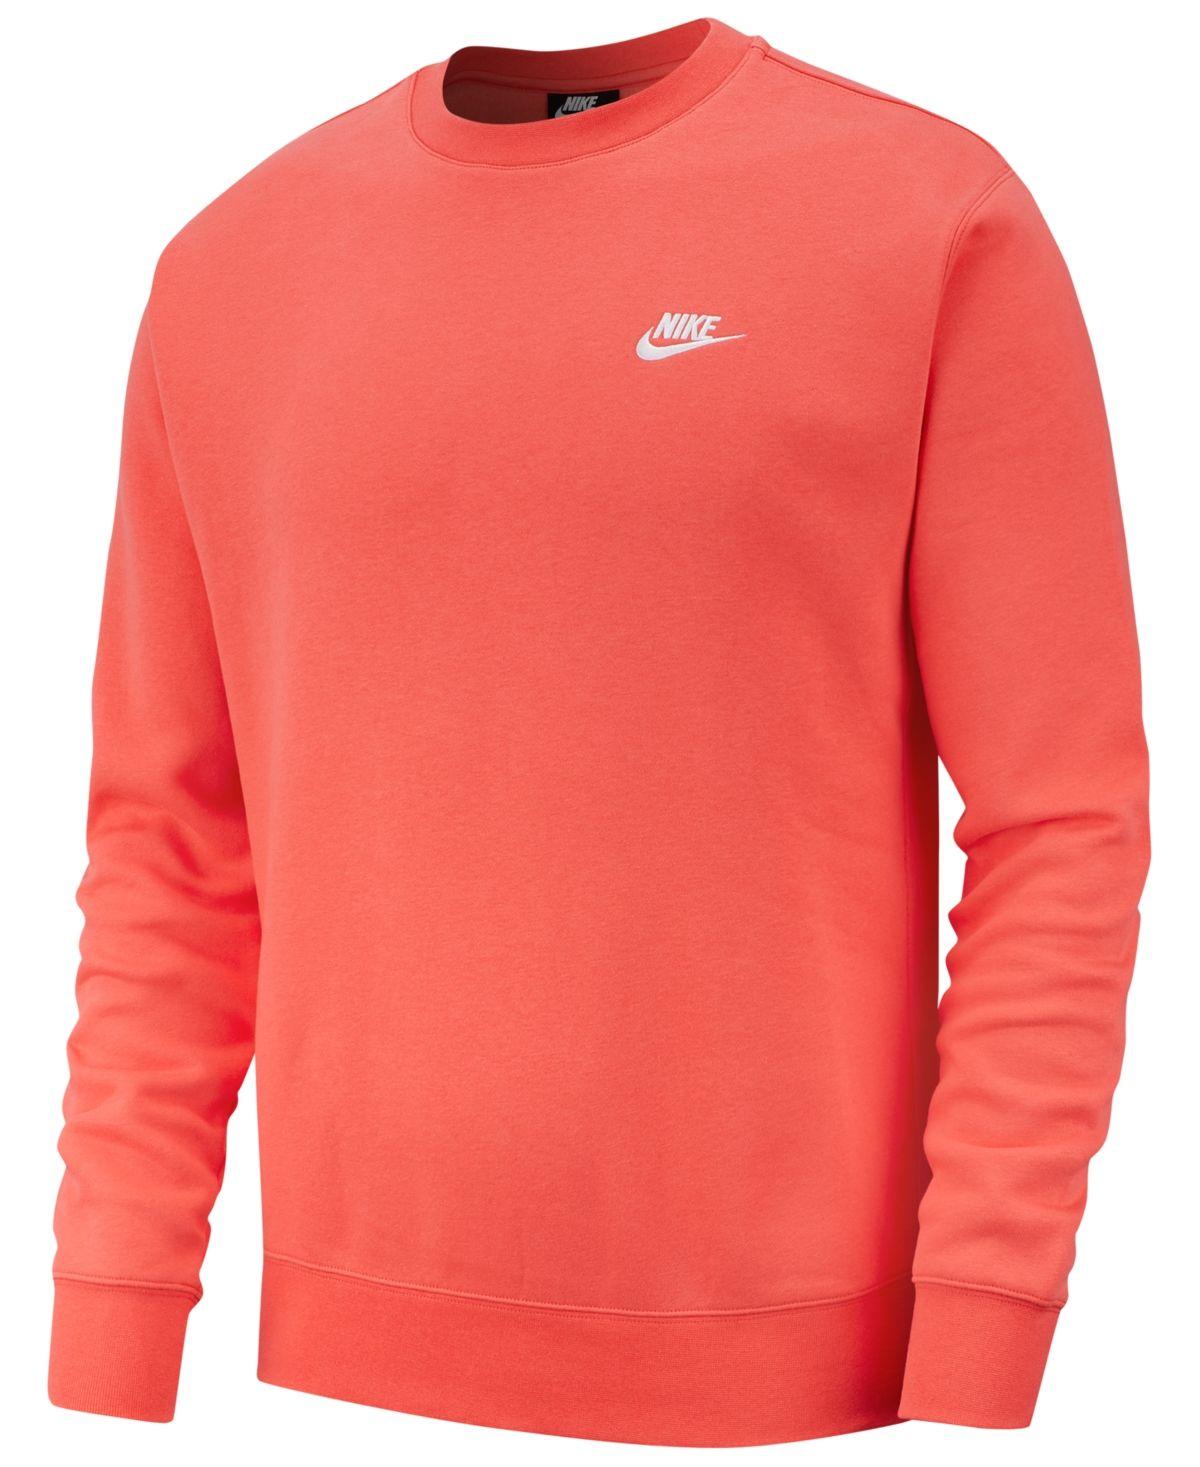 Nike Men S Club Fleece Crew Sweatshirt Reviews All Activewear Men Macy S Nike Clothes Mens Mens Sweatshirts Sweatshirts [ 1467 x 1200 Pixel ]